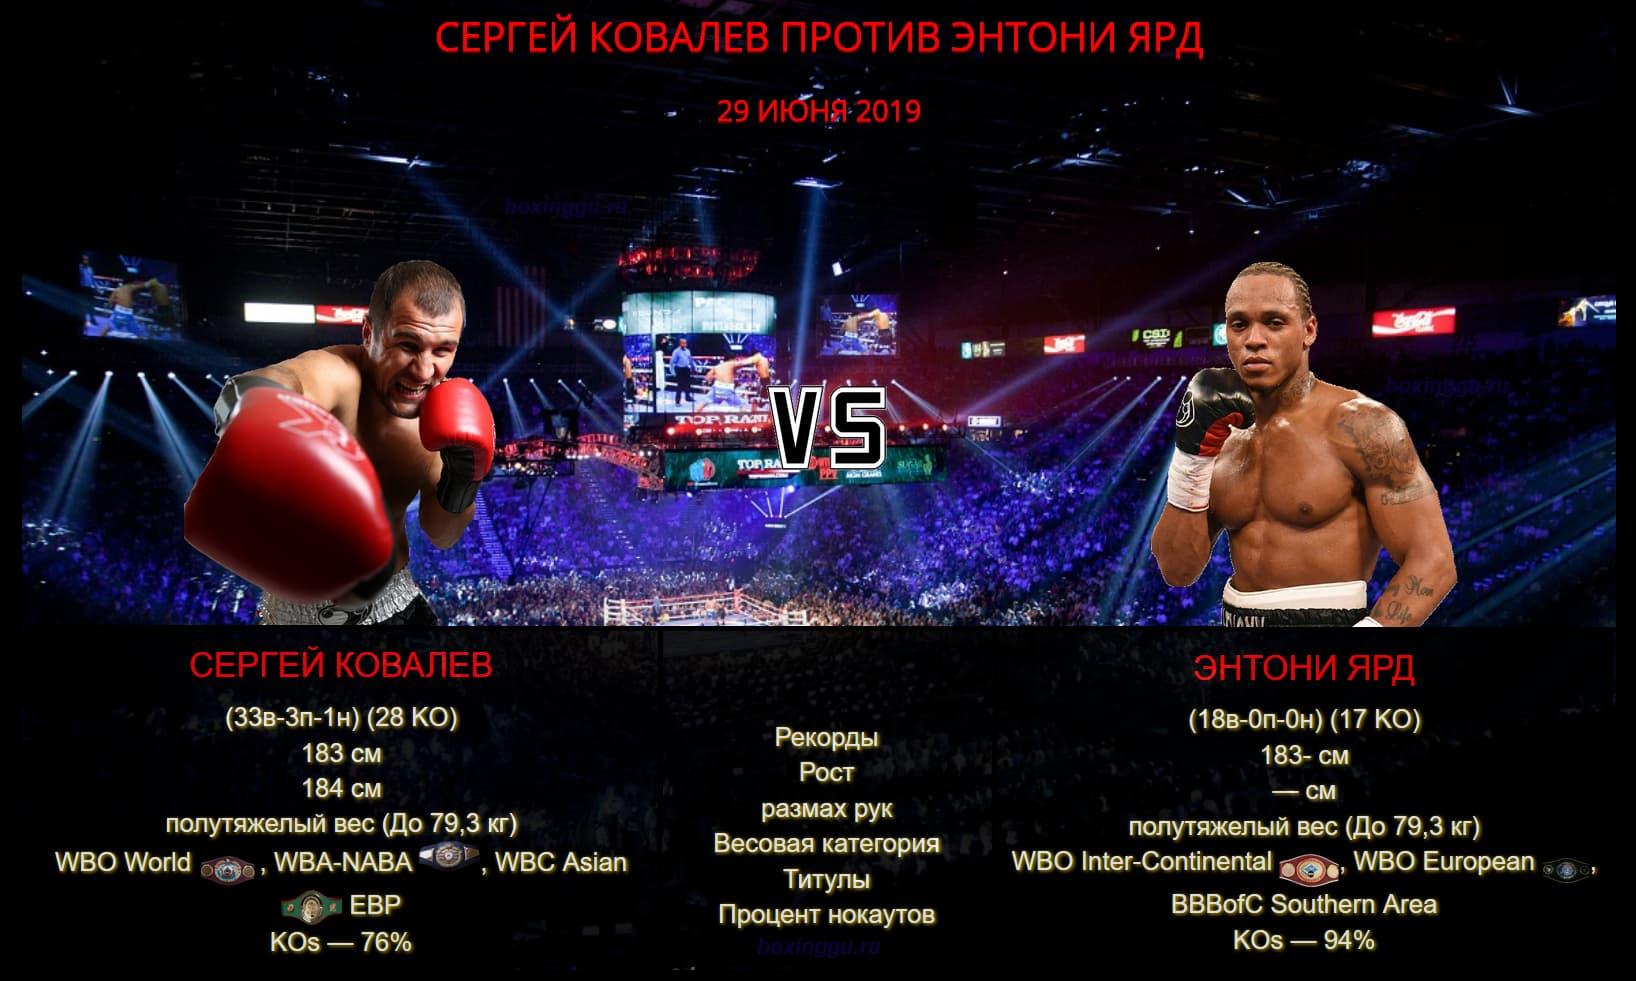 Афиша: Бой Сергей Ковалев против Энтони Ярда - Sergey Kovalev vs Anthony Yarde